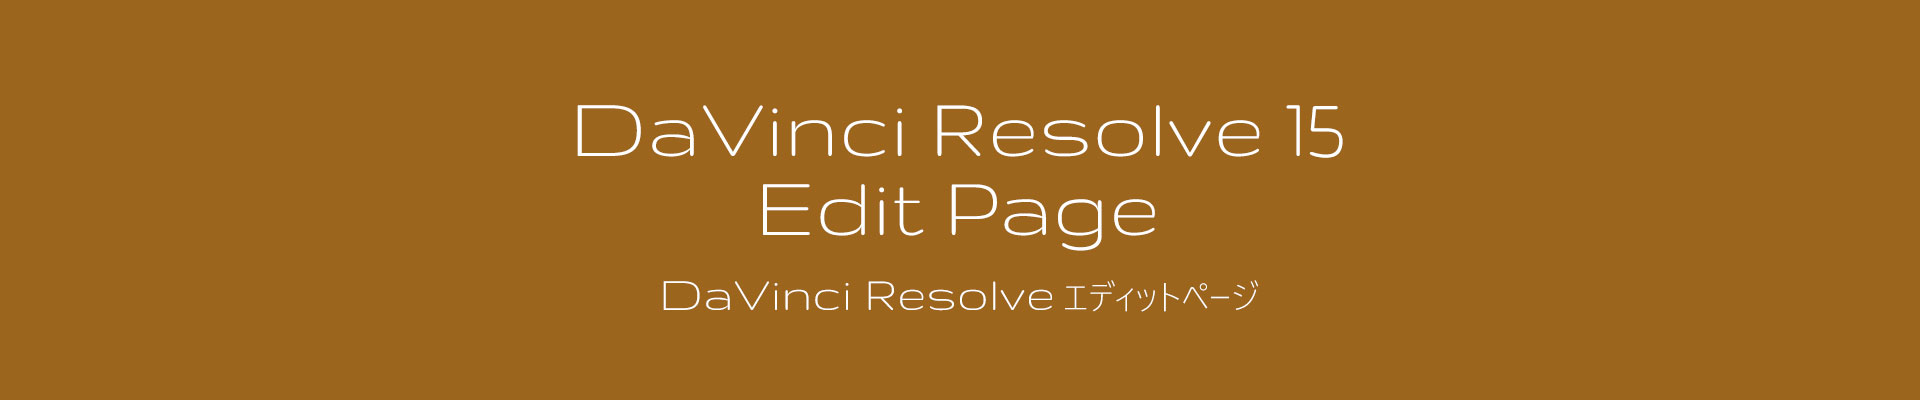 DaVinciResolve15 Edit Page